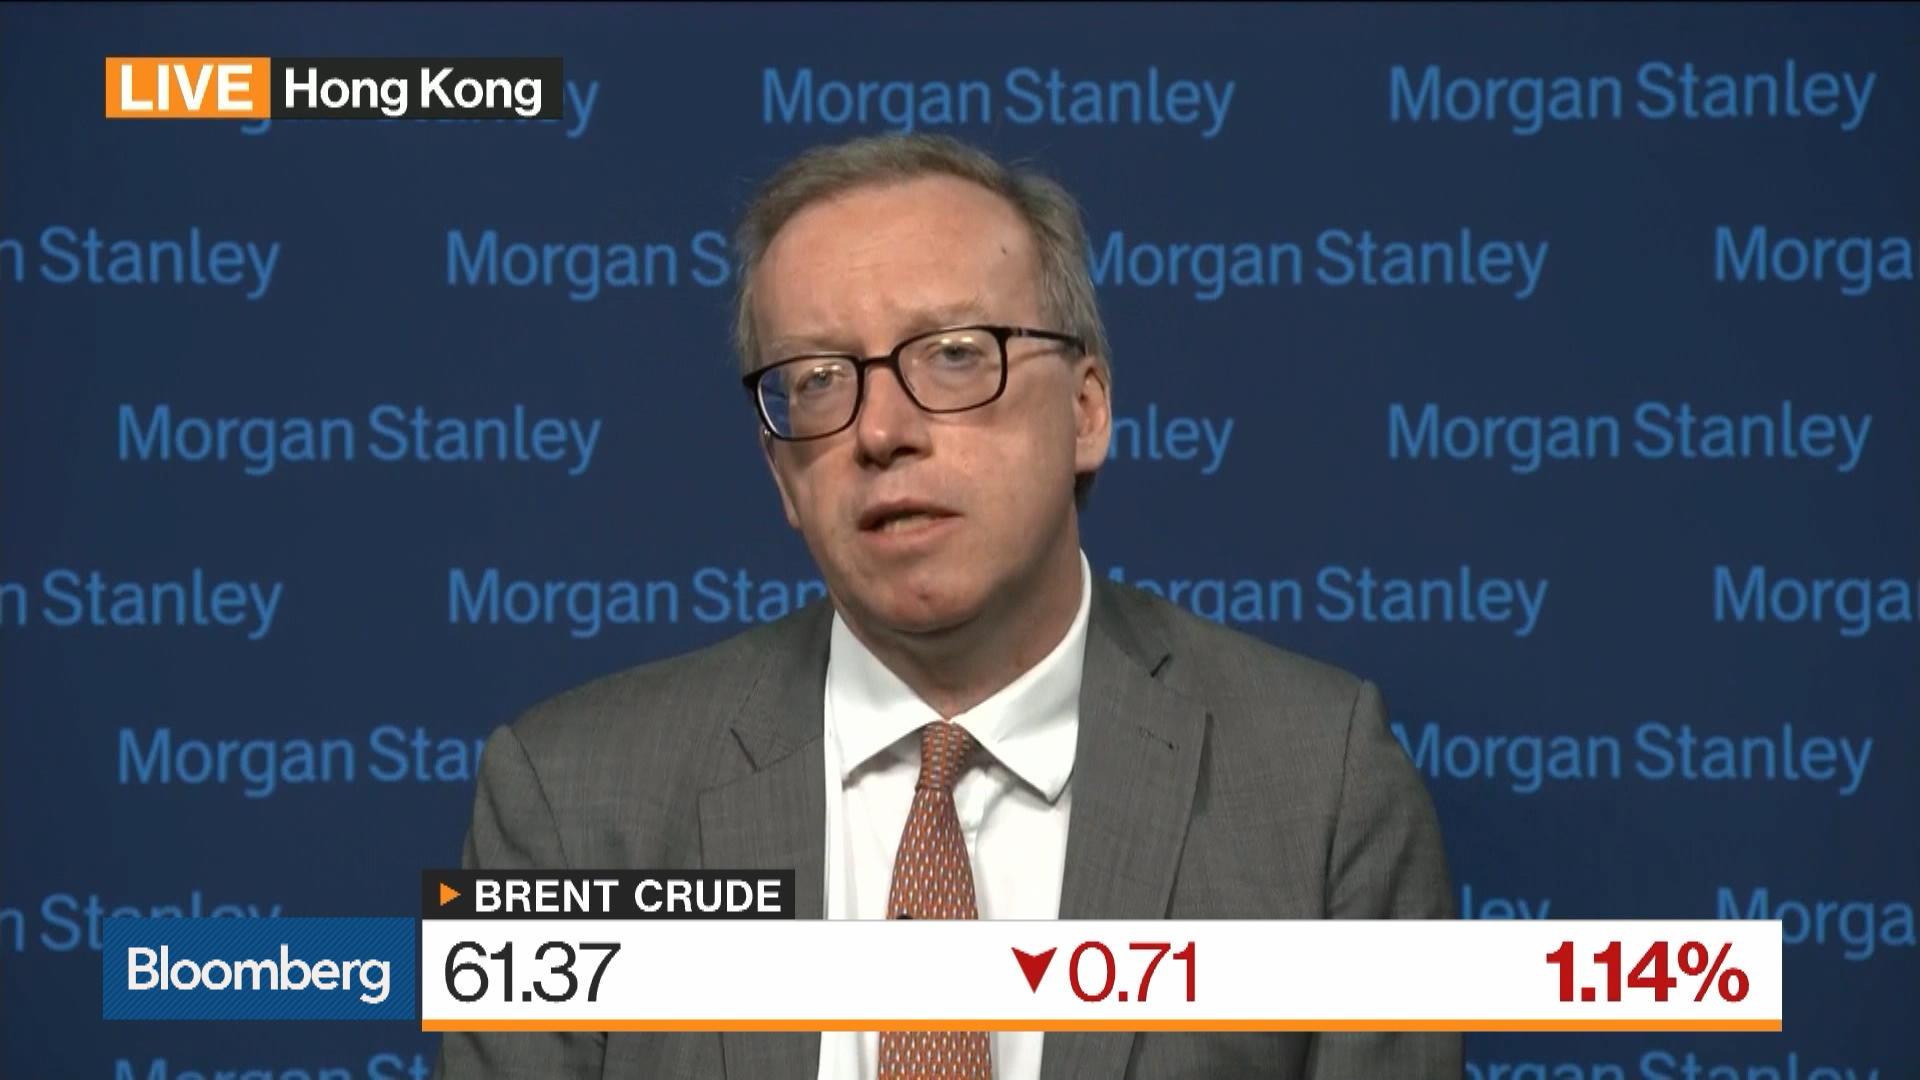 Morgan Stanley Sees Msci Em At 1050 By End Of 2019 Bloomberg